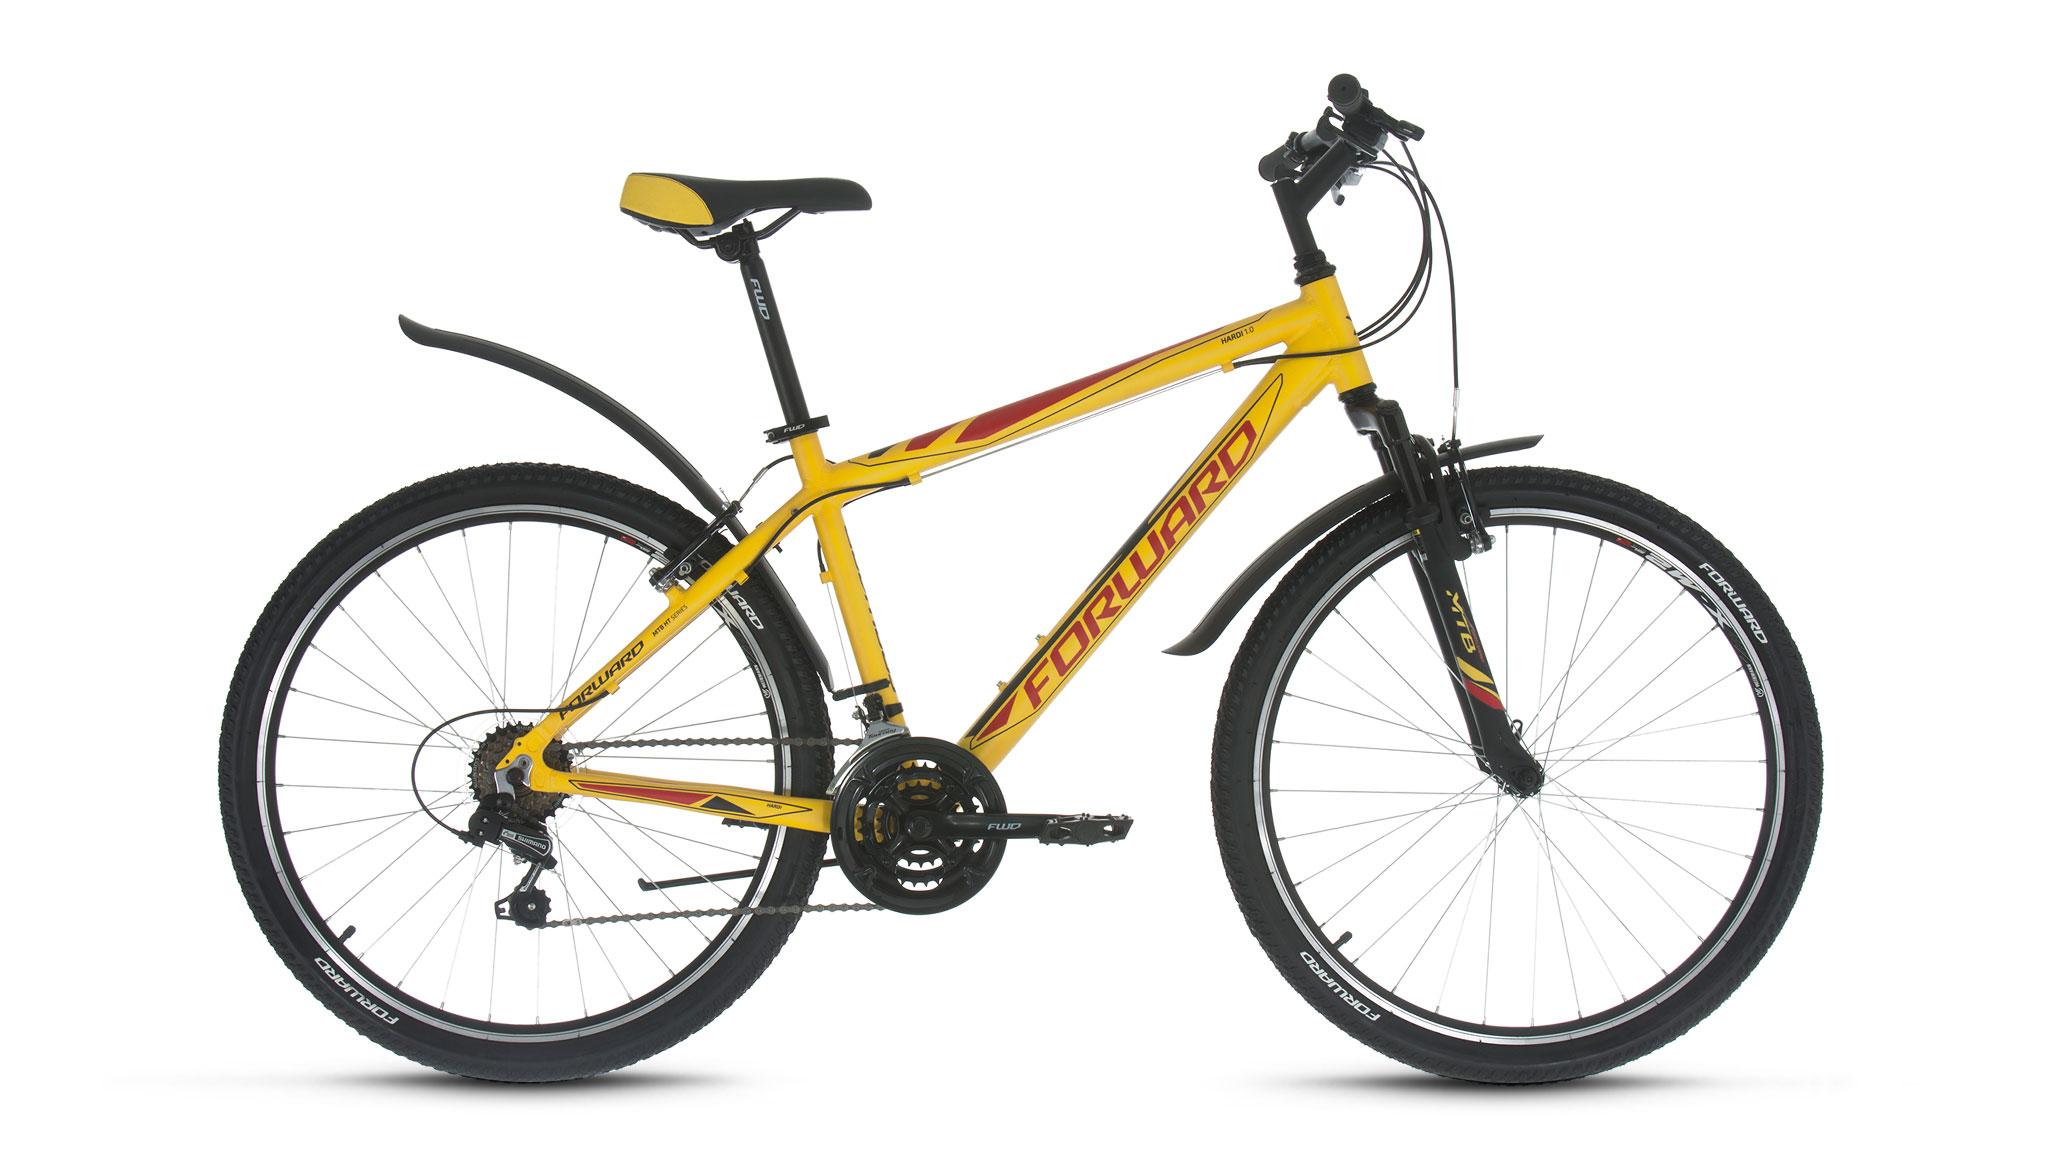 Велосипед Forward Hardi 1.0 2018 желтый 17 д